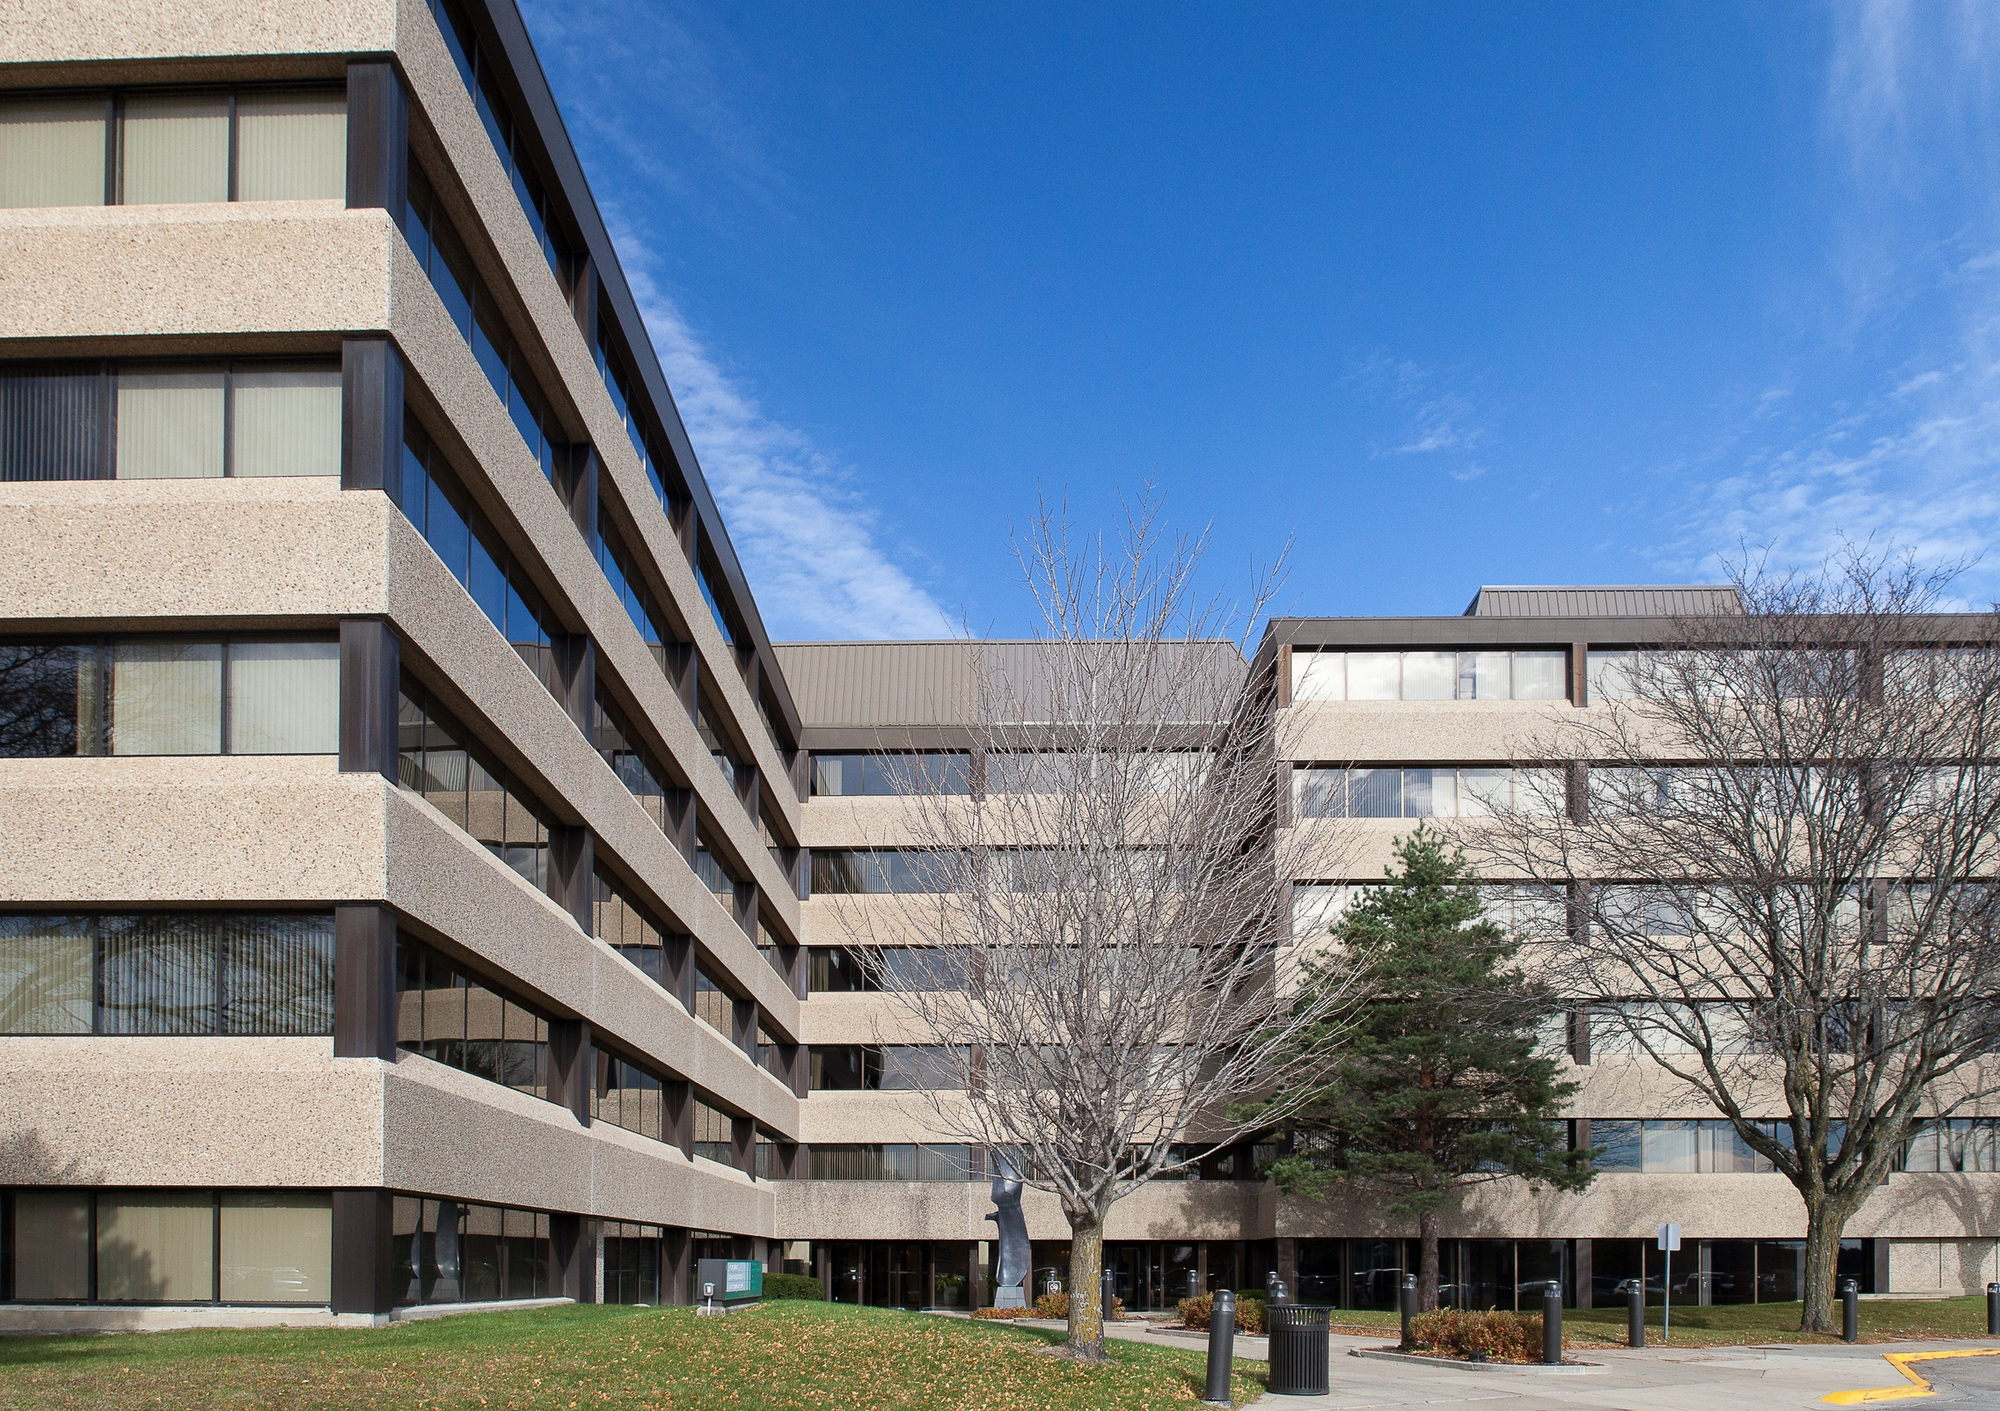 Des Moines Clinic exterior